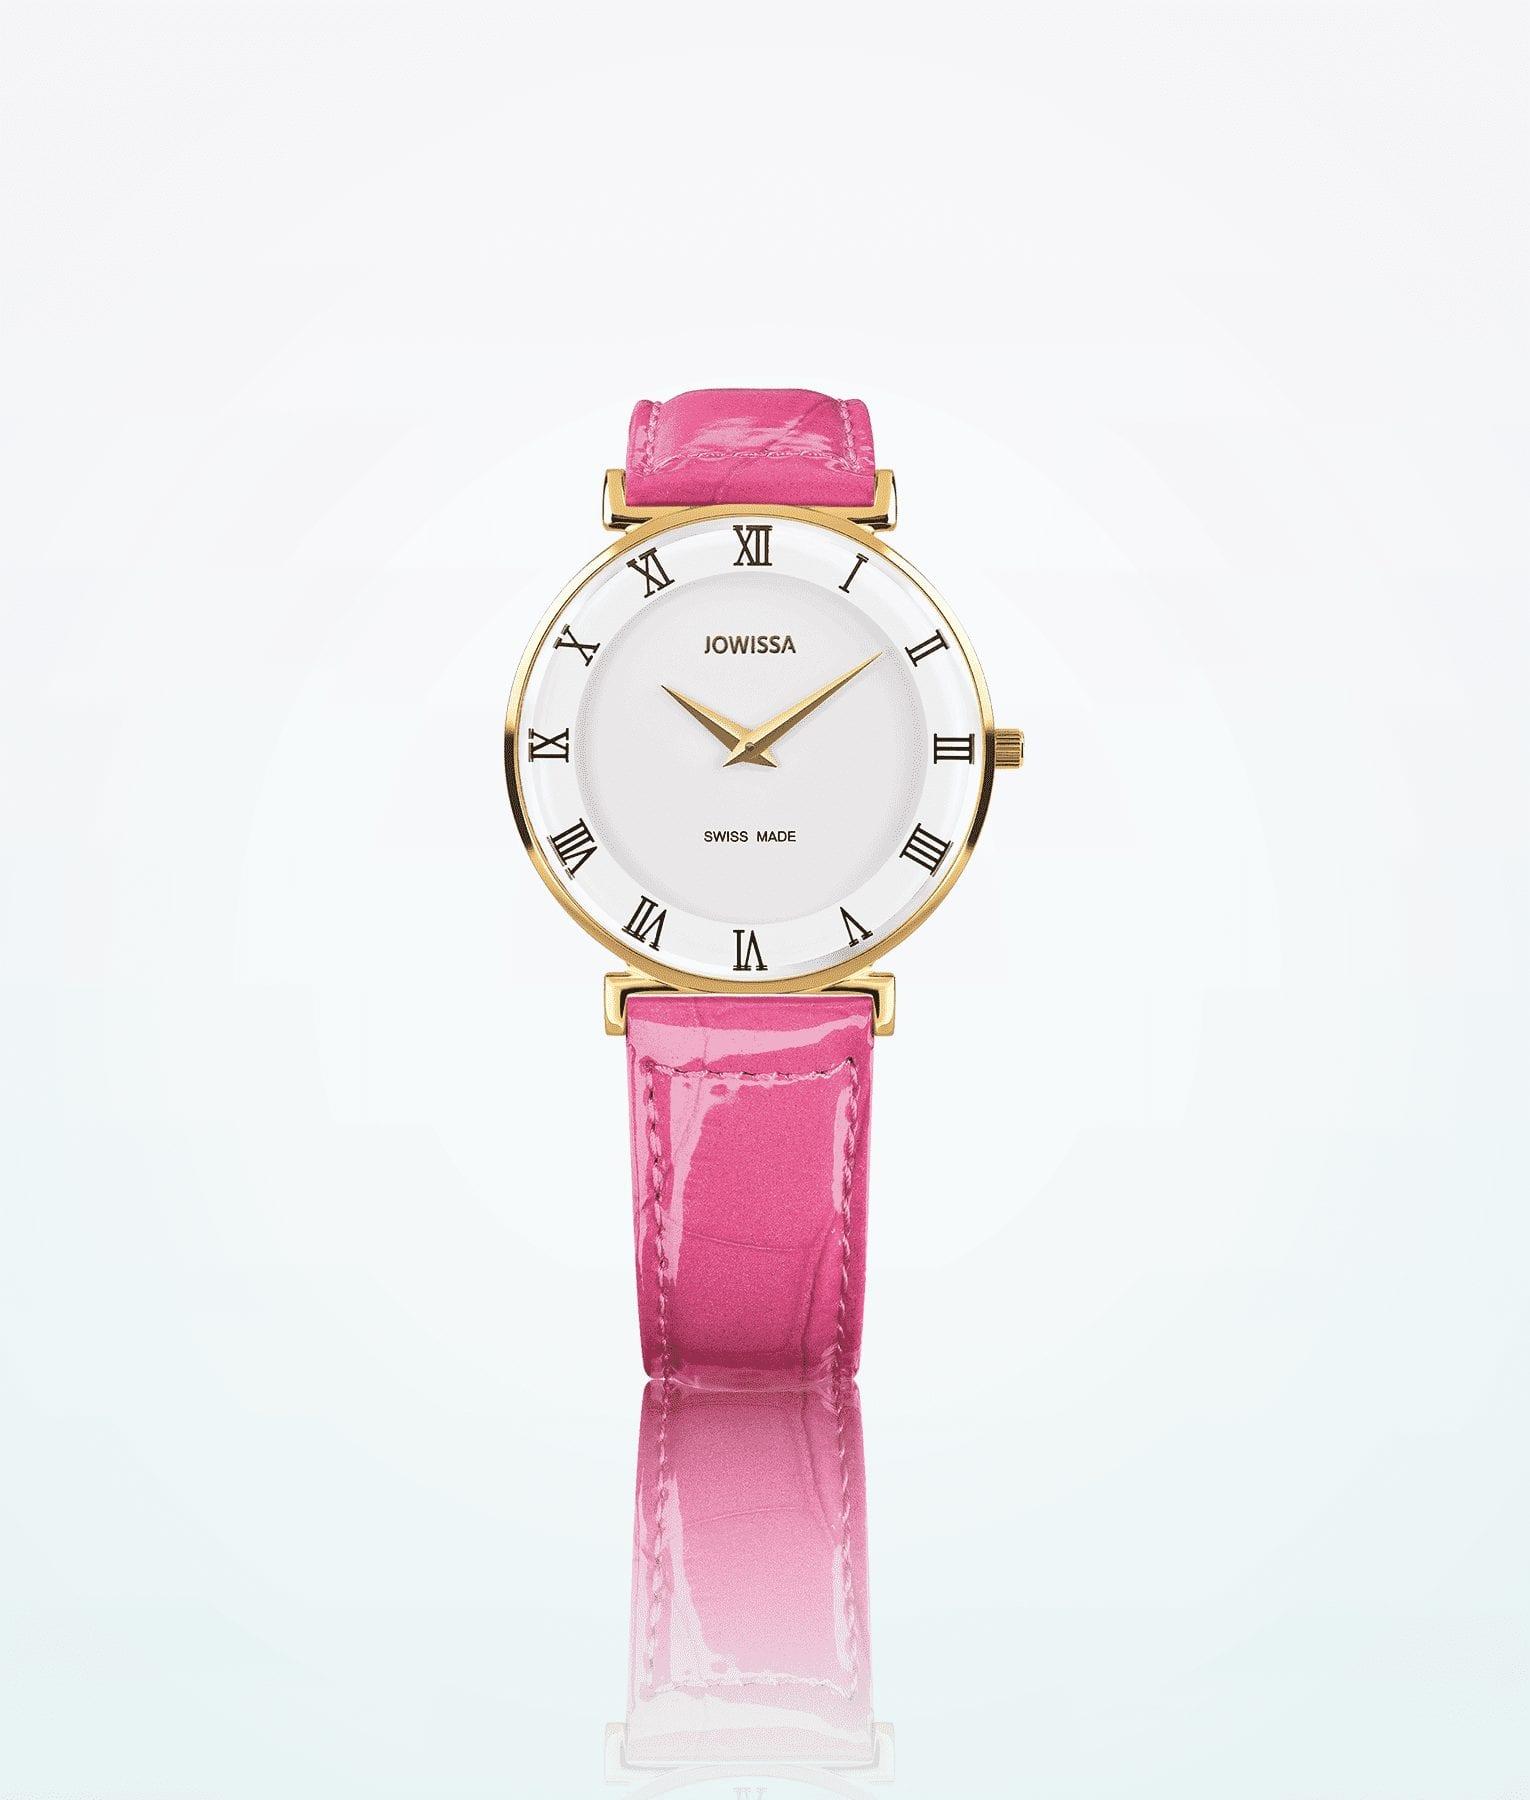 jowissa-roma-gold-women-wristwatch